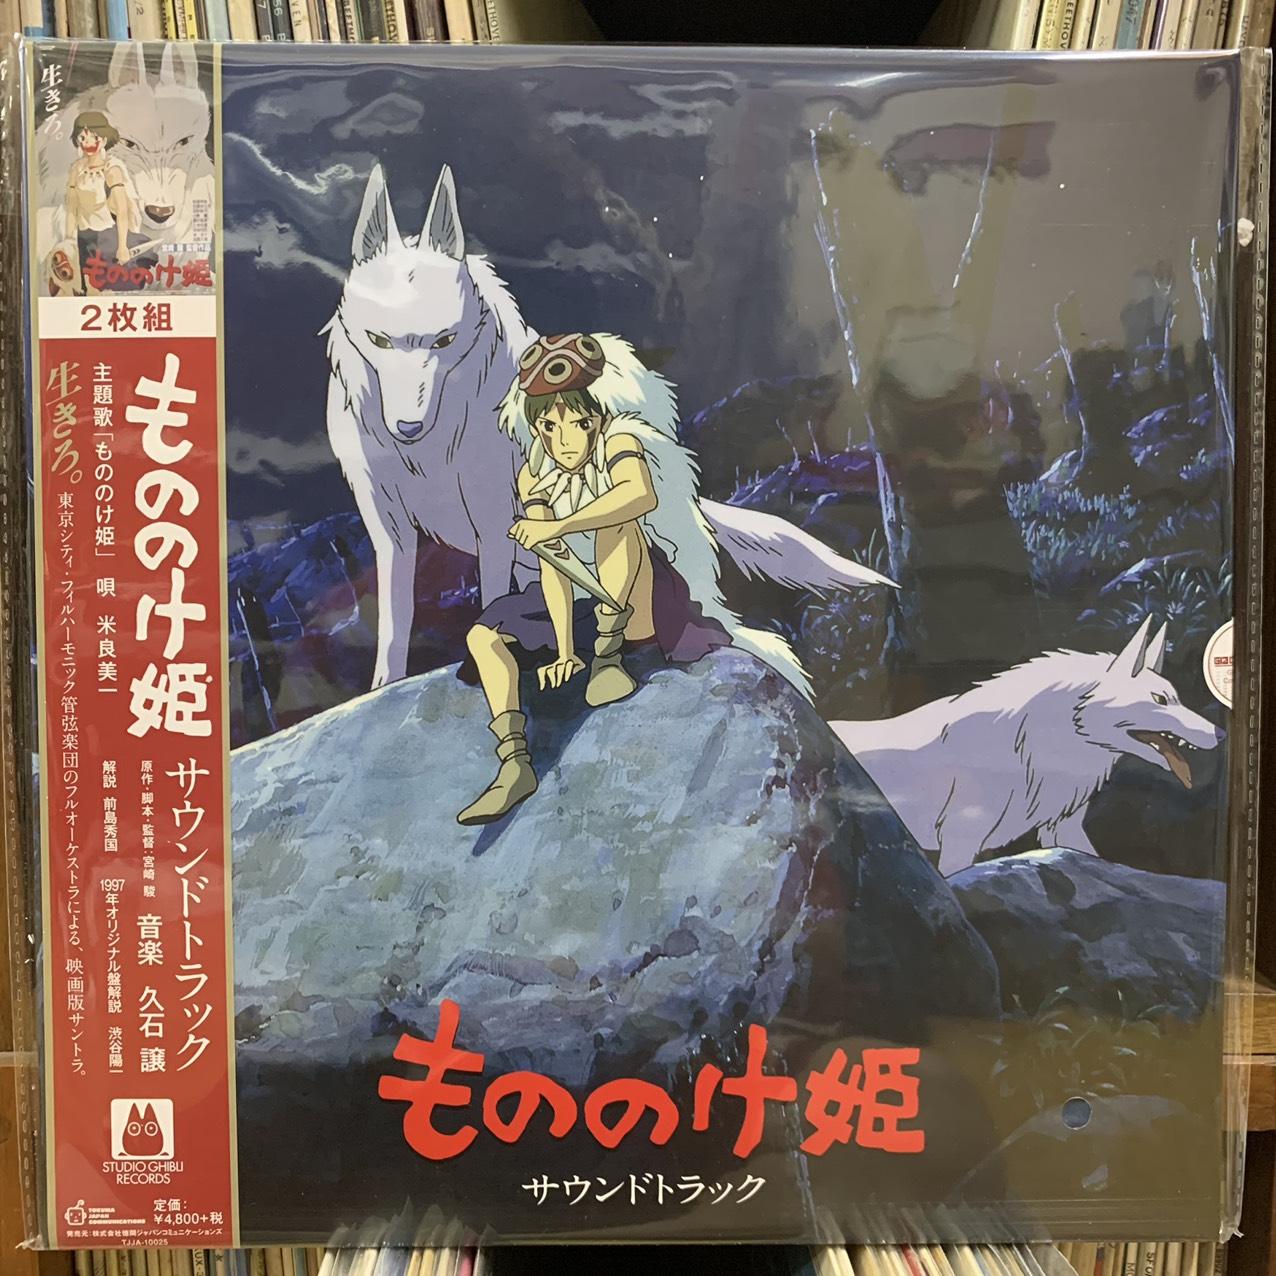 dia-than-lp-cong-chua-soi-mononoke-soundtrack-studio-ghibli